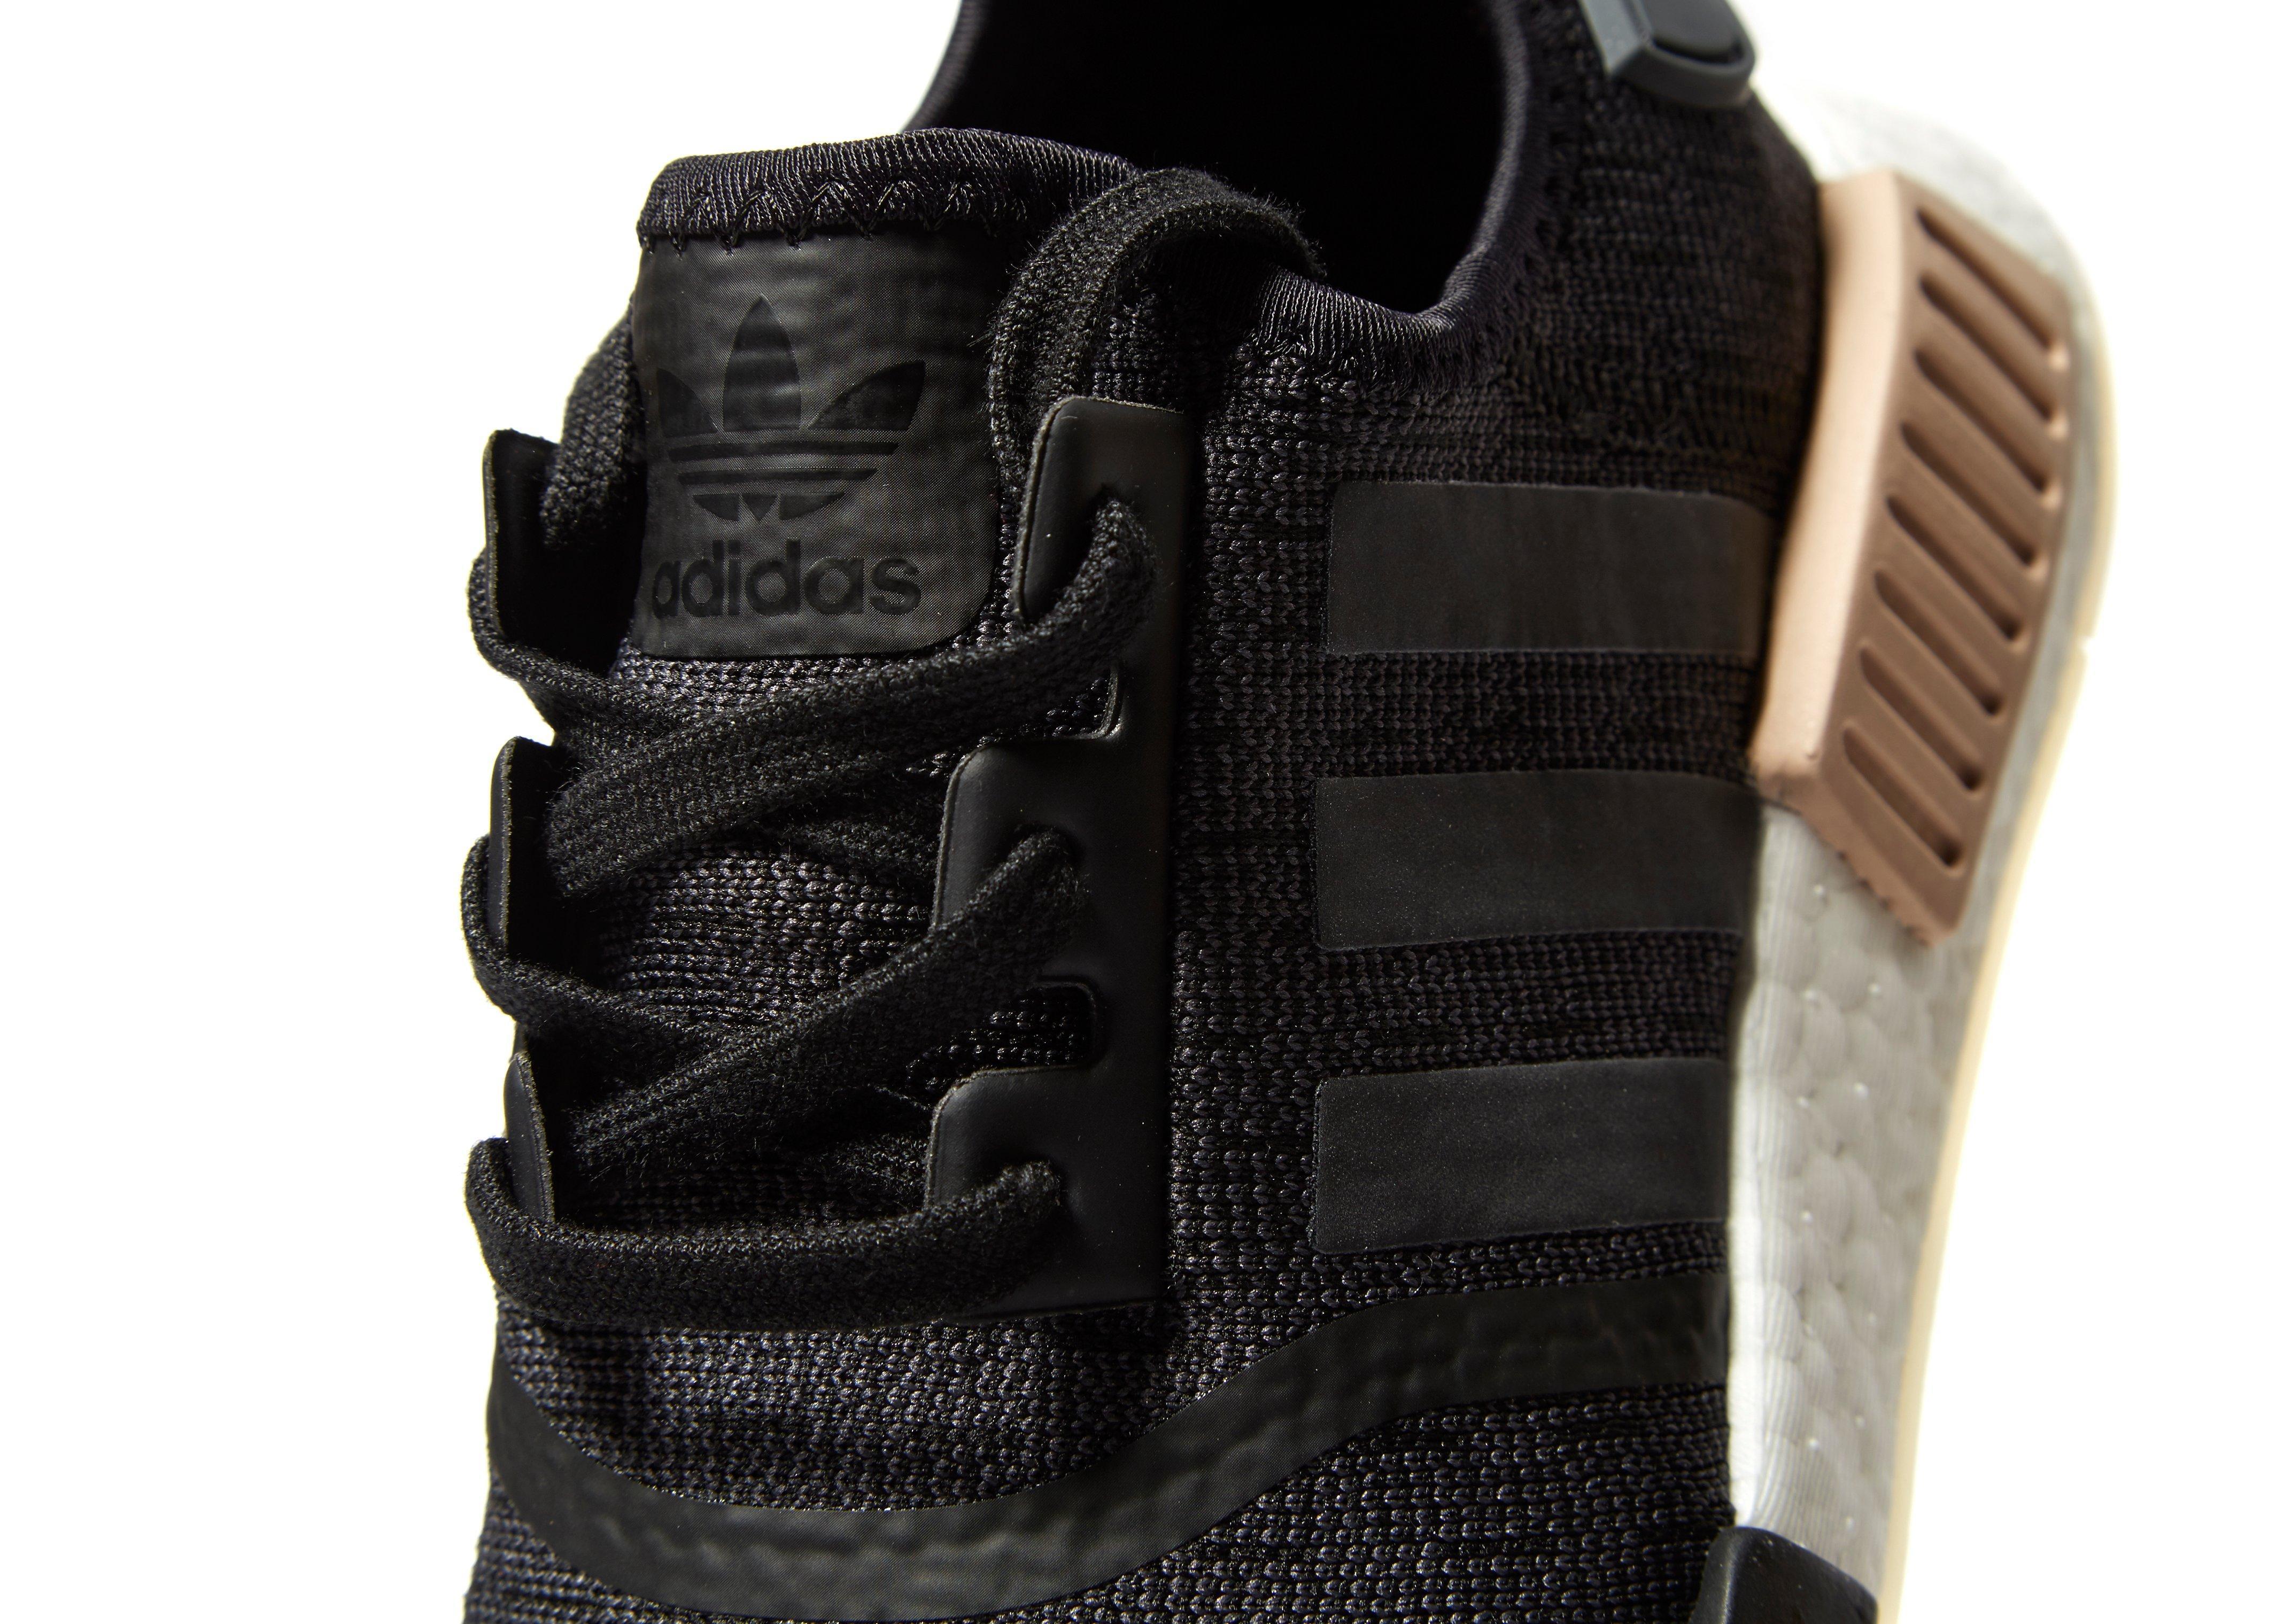 1447a11e88da5 Lyst - adidas Originals Nmd r1 in Black